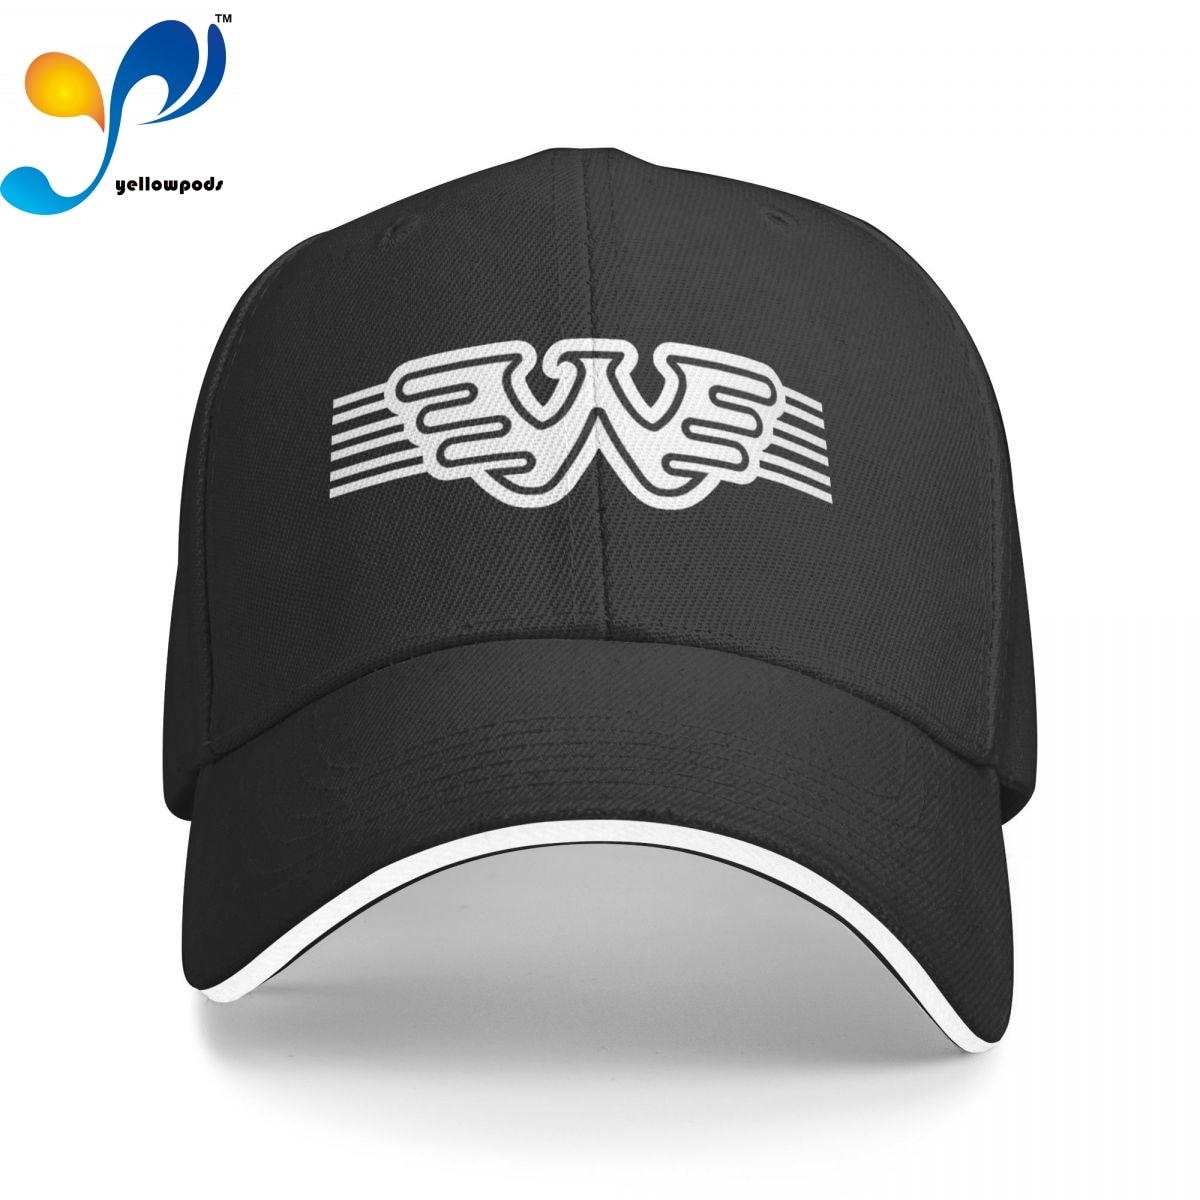 Кепки Waylon, Кепка-бейсболка Jennings, Кепка-бейсболка для мужчин, мужские кепки с Бейсбольным клапаном, кепки с логотипом